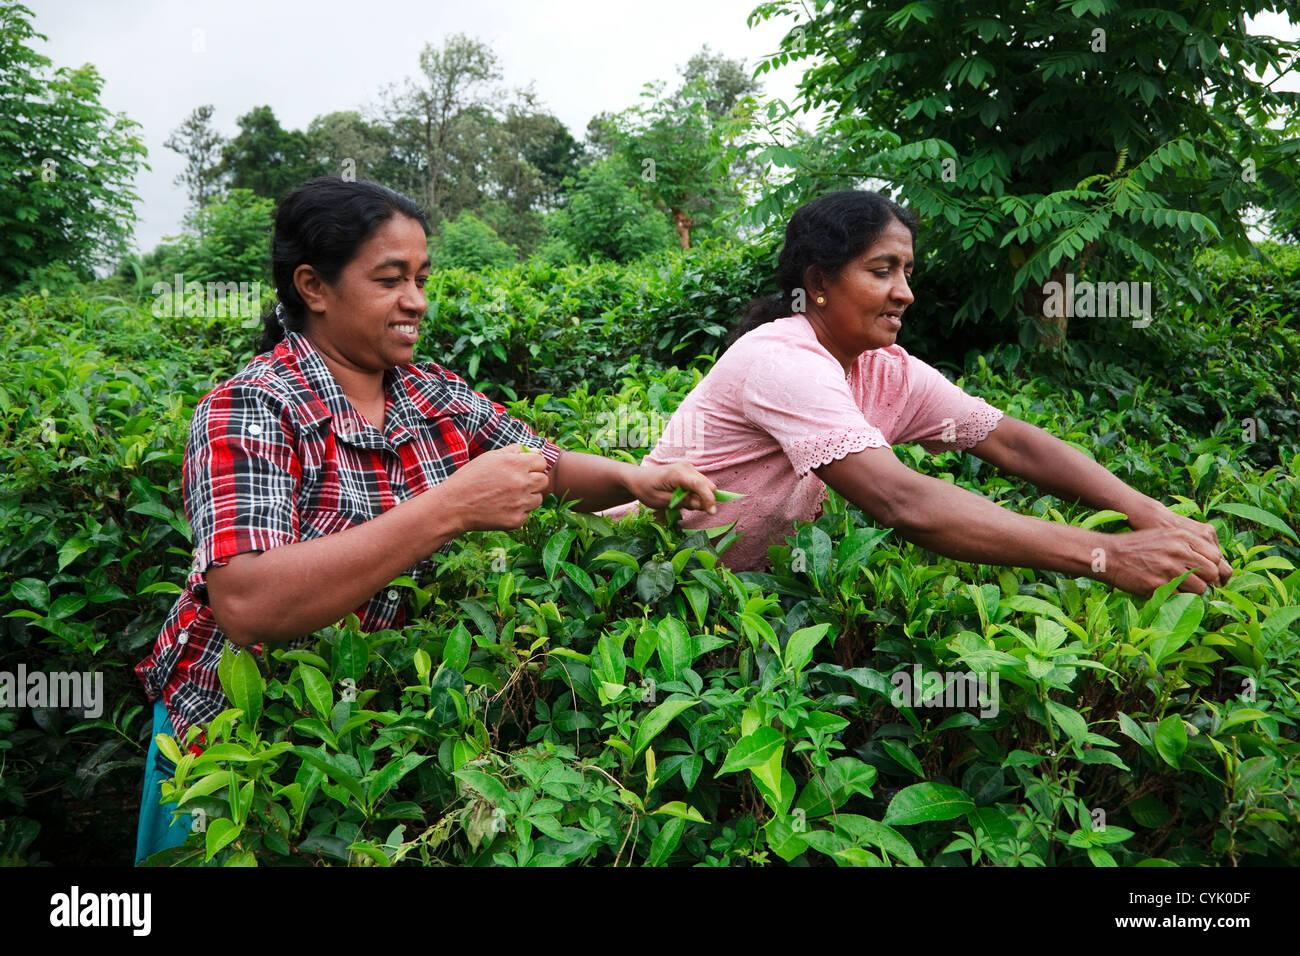 Two women picking tea leaves at a plantation, Sri Lanka Stock Photo